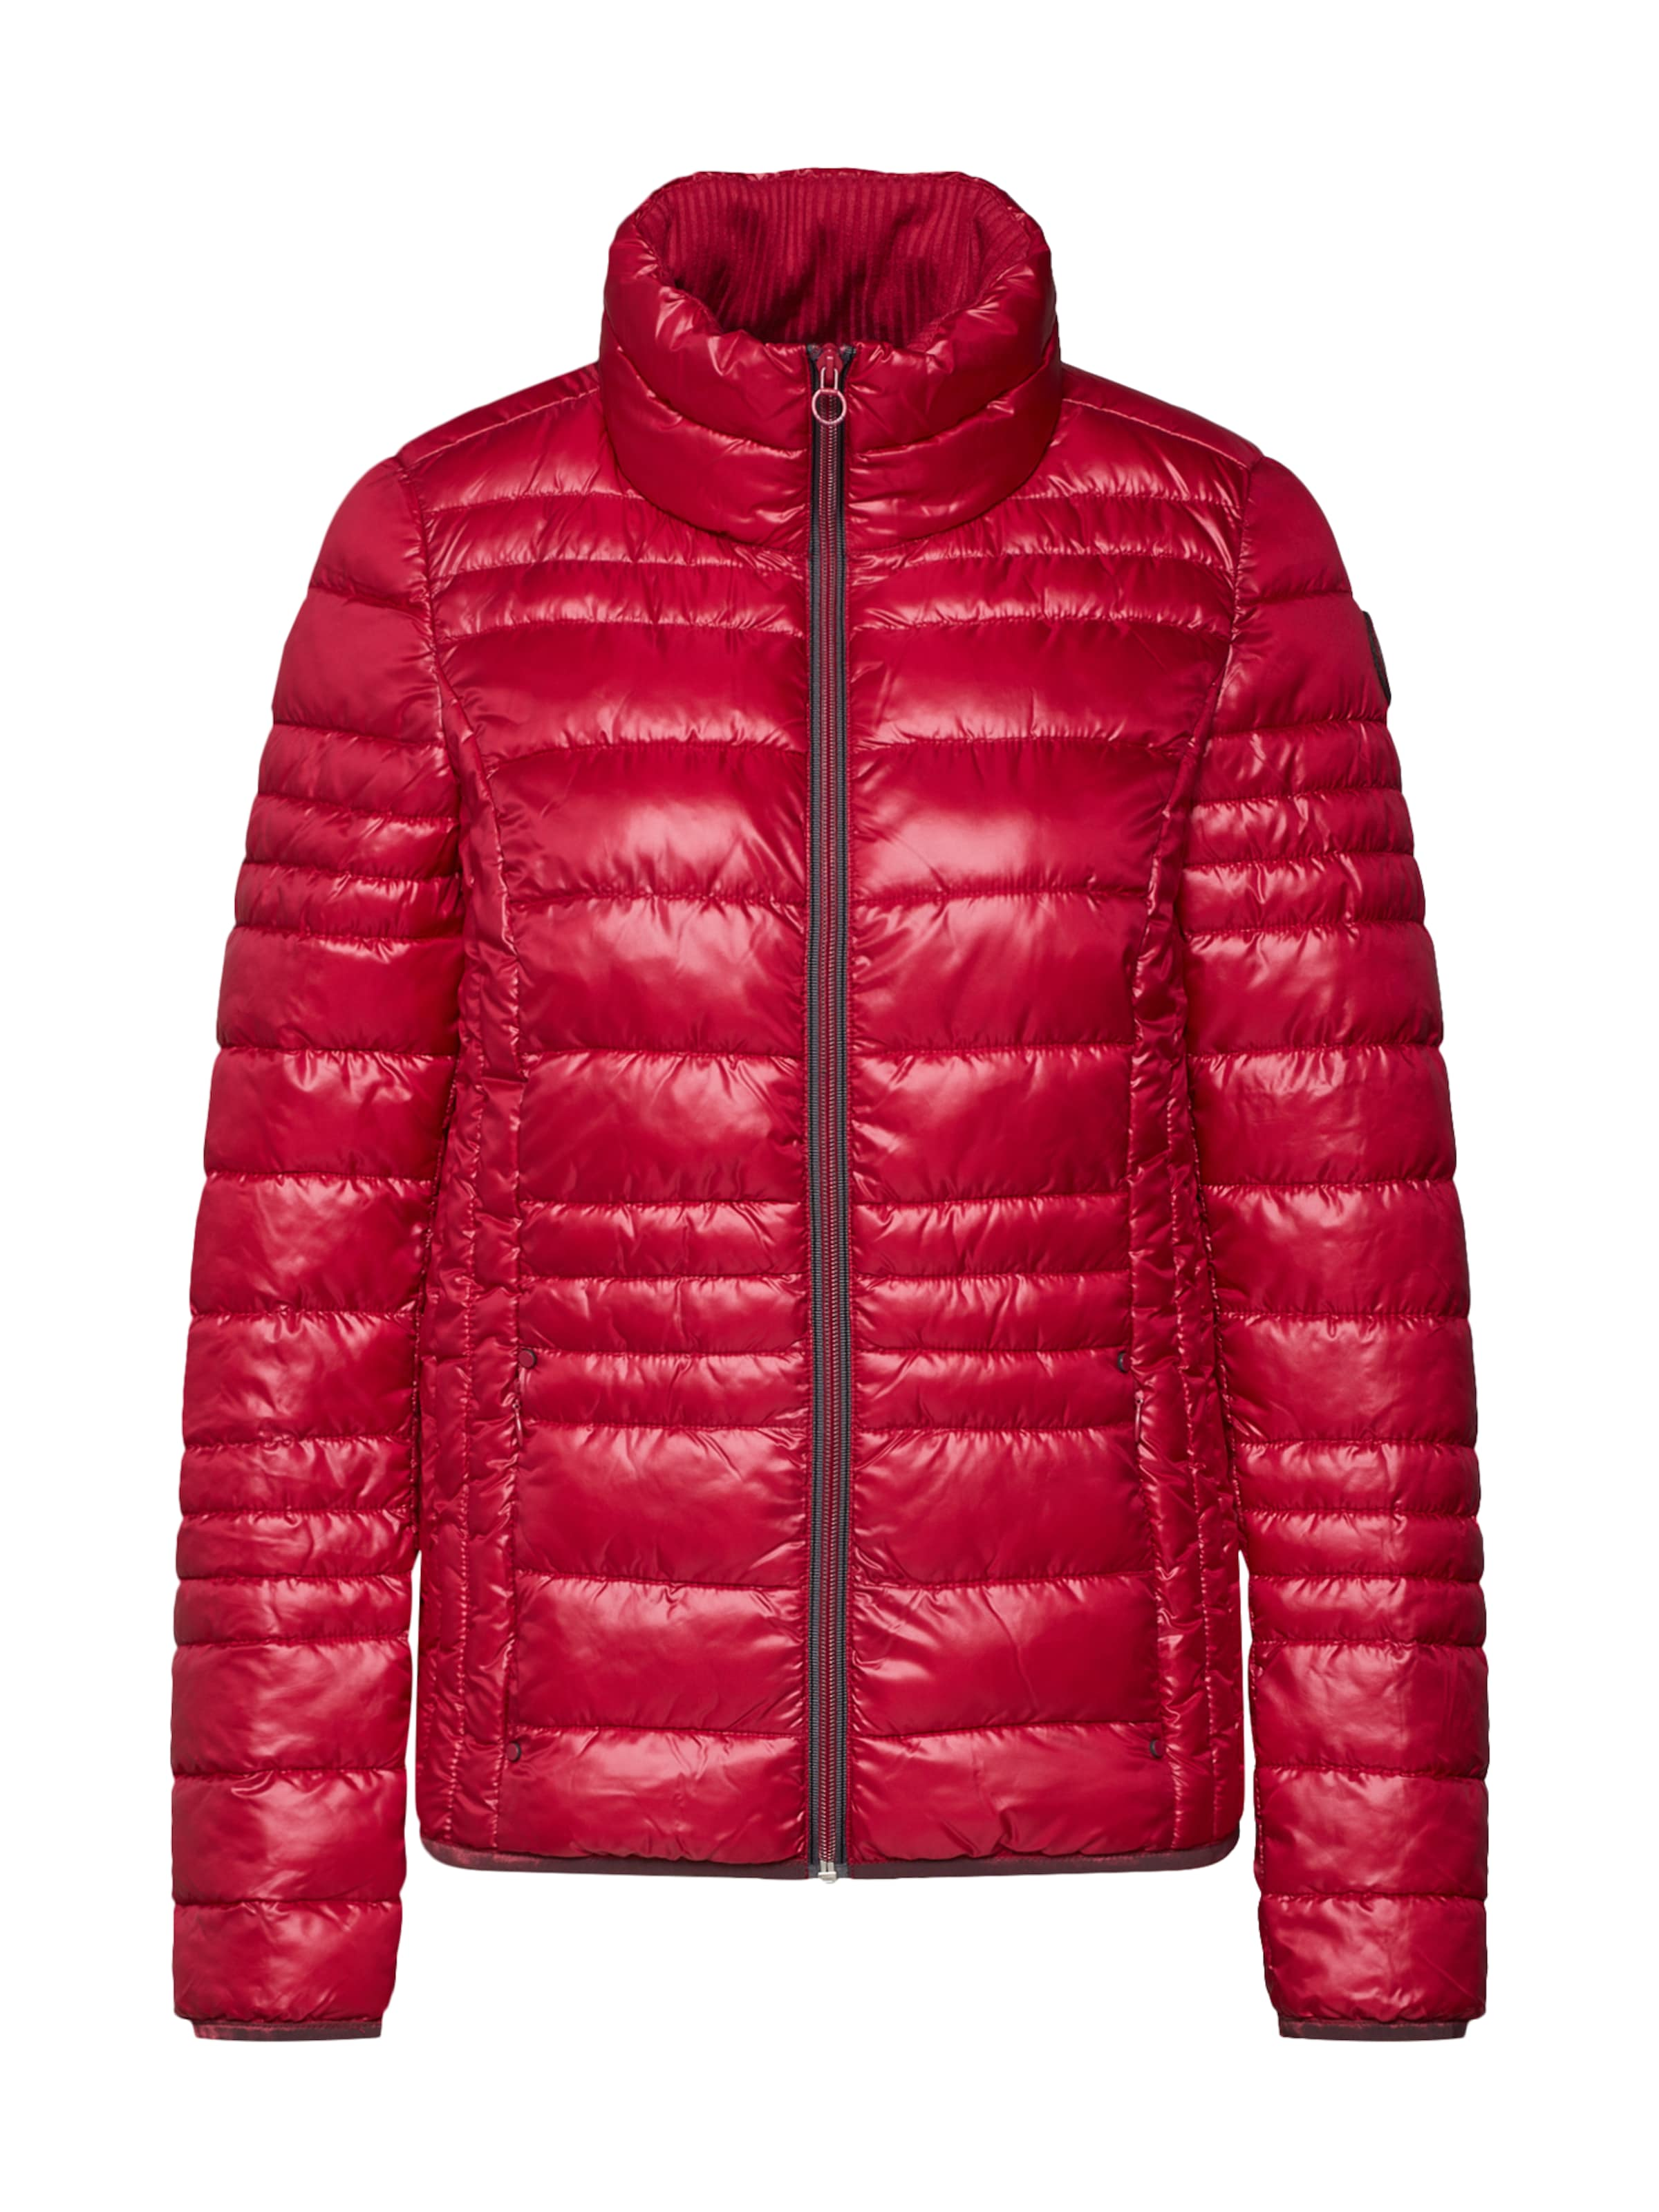 oliver Jacke Cyclam Red In Label S VjSGLUzpMq